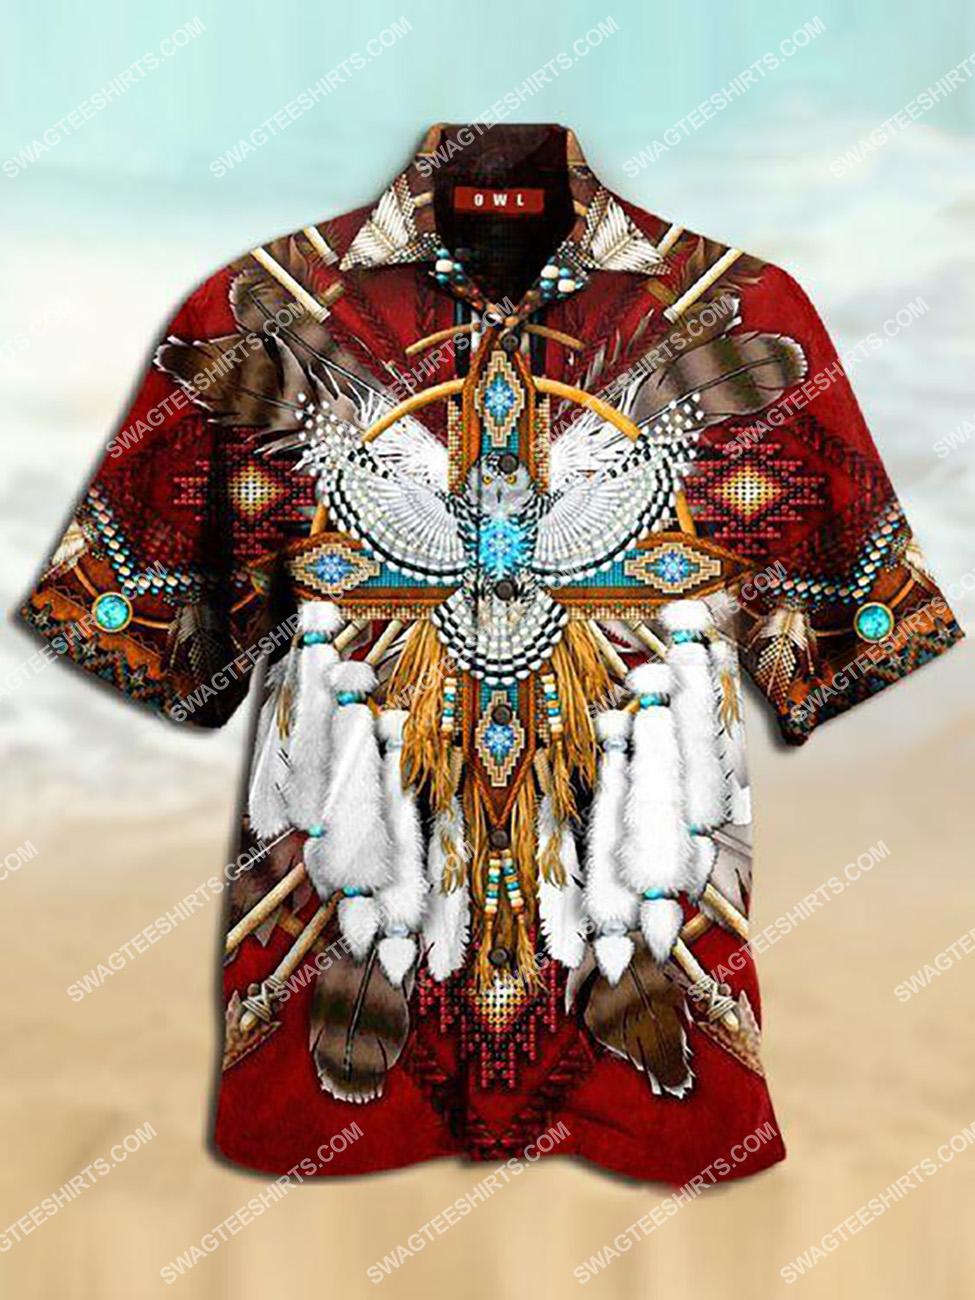 the native american owl all over printed hawaiian shirt 1(3) - Copy